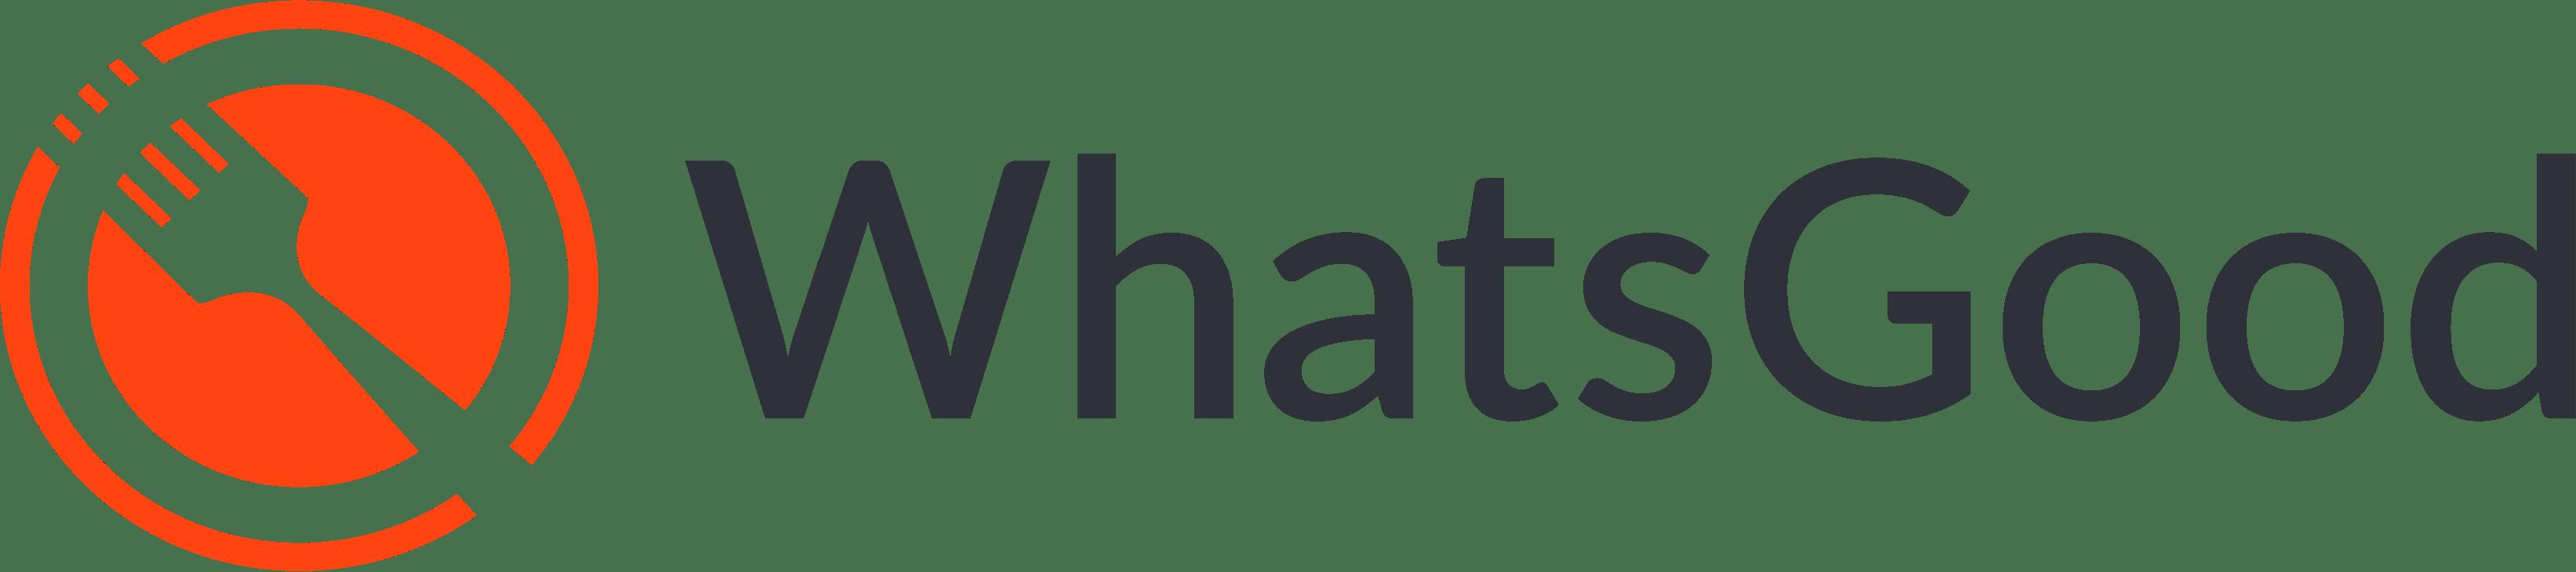 WhatsGood company logo